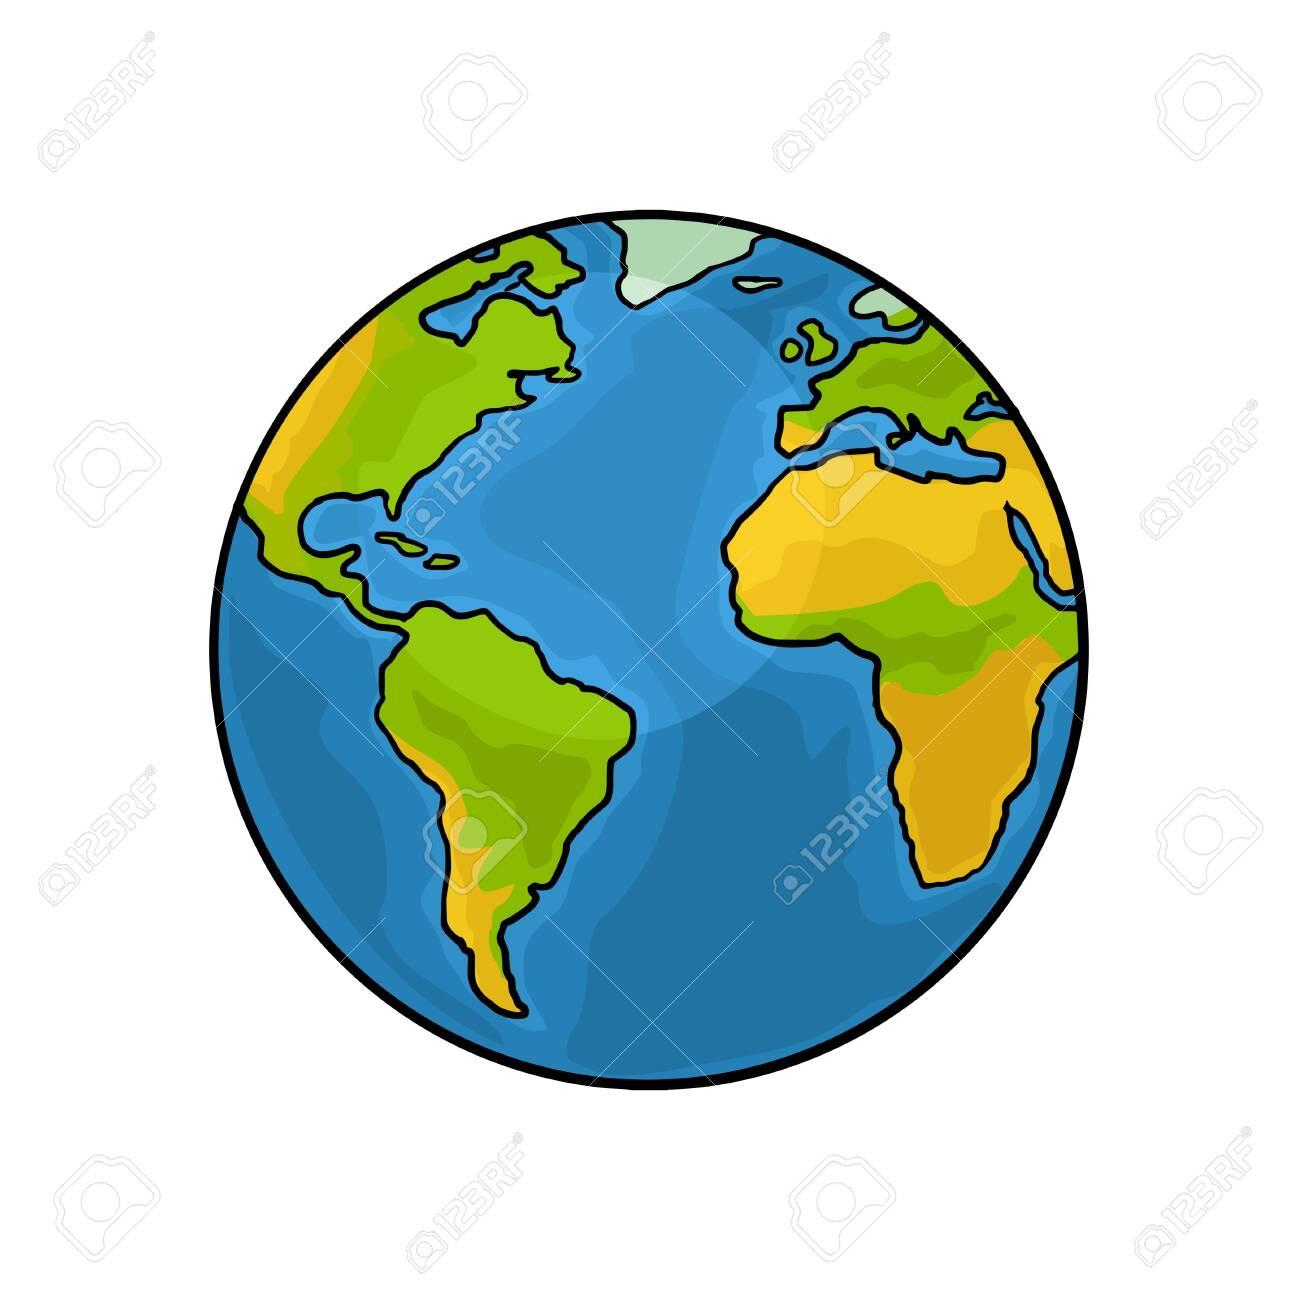 Earth planet. Vector color vintage engraving illustration - 145822588